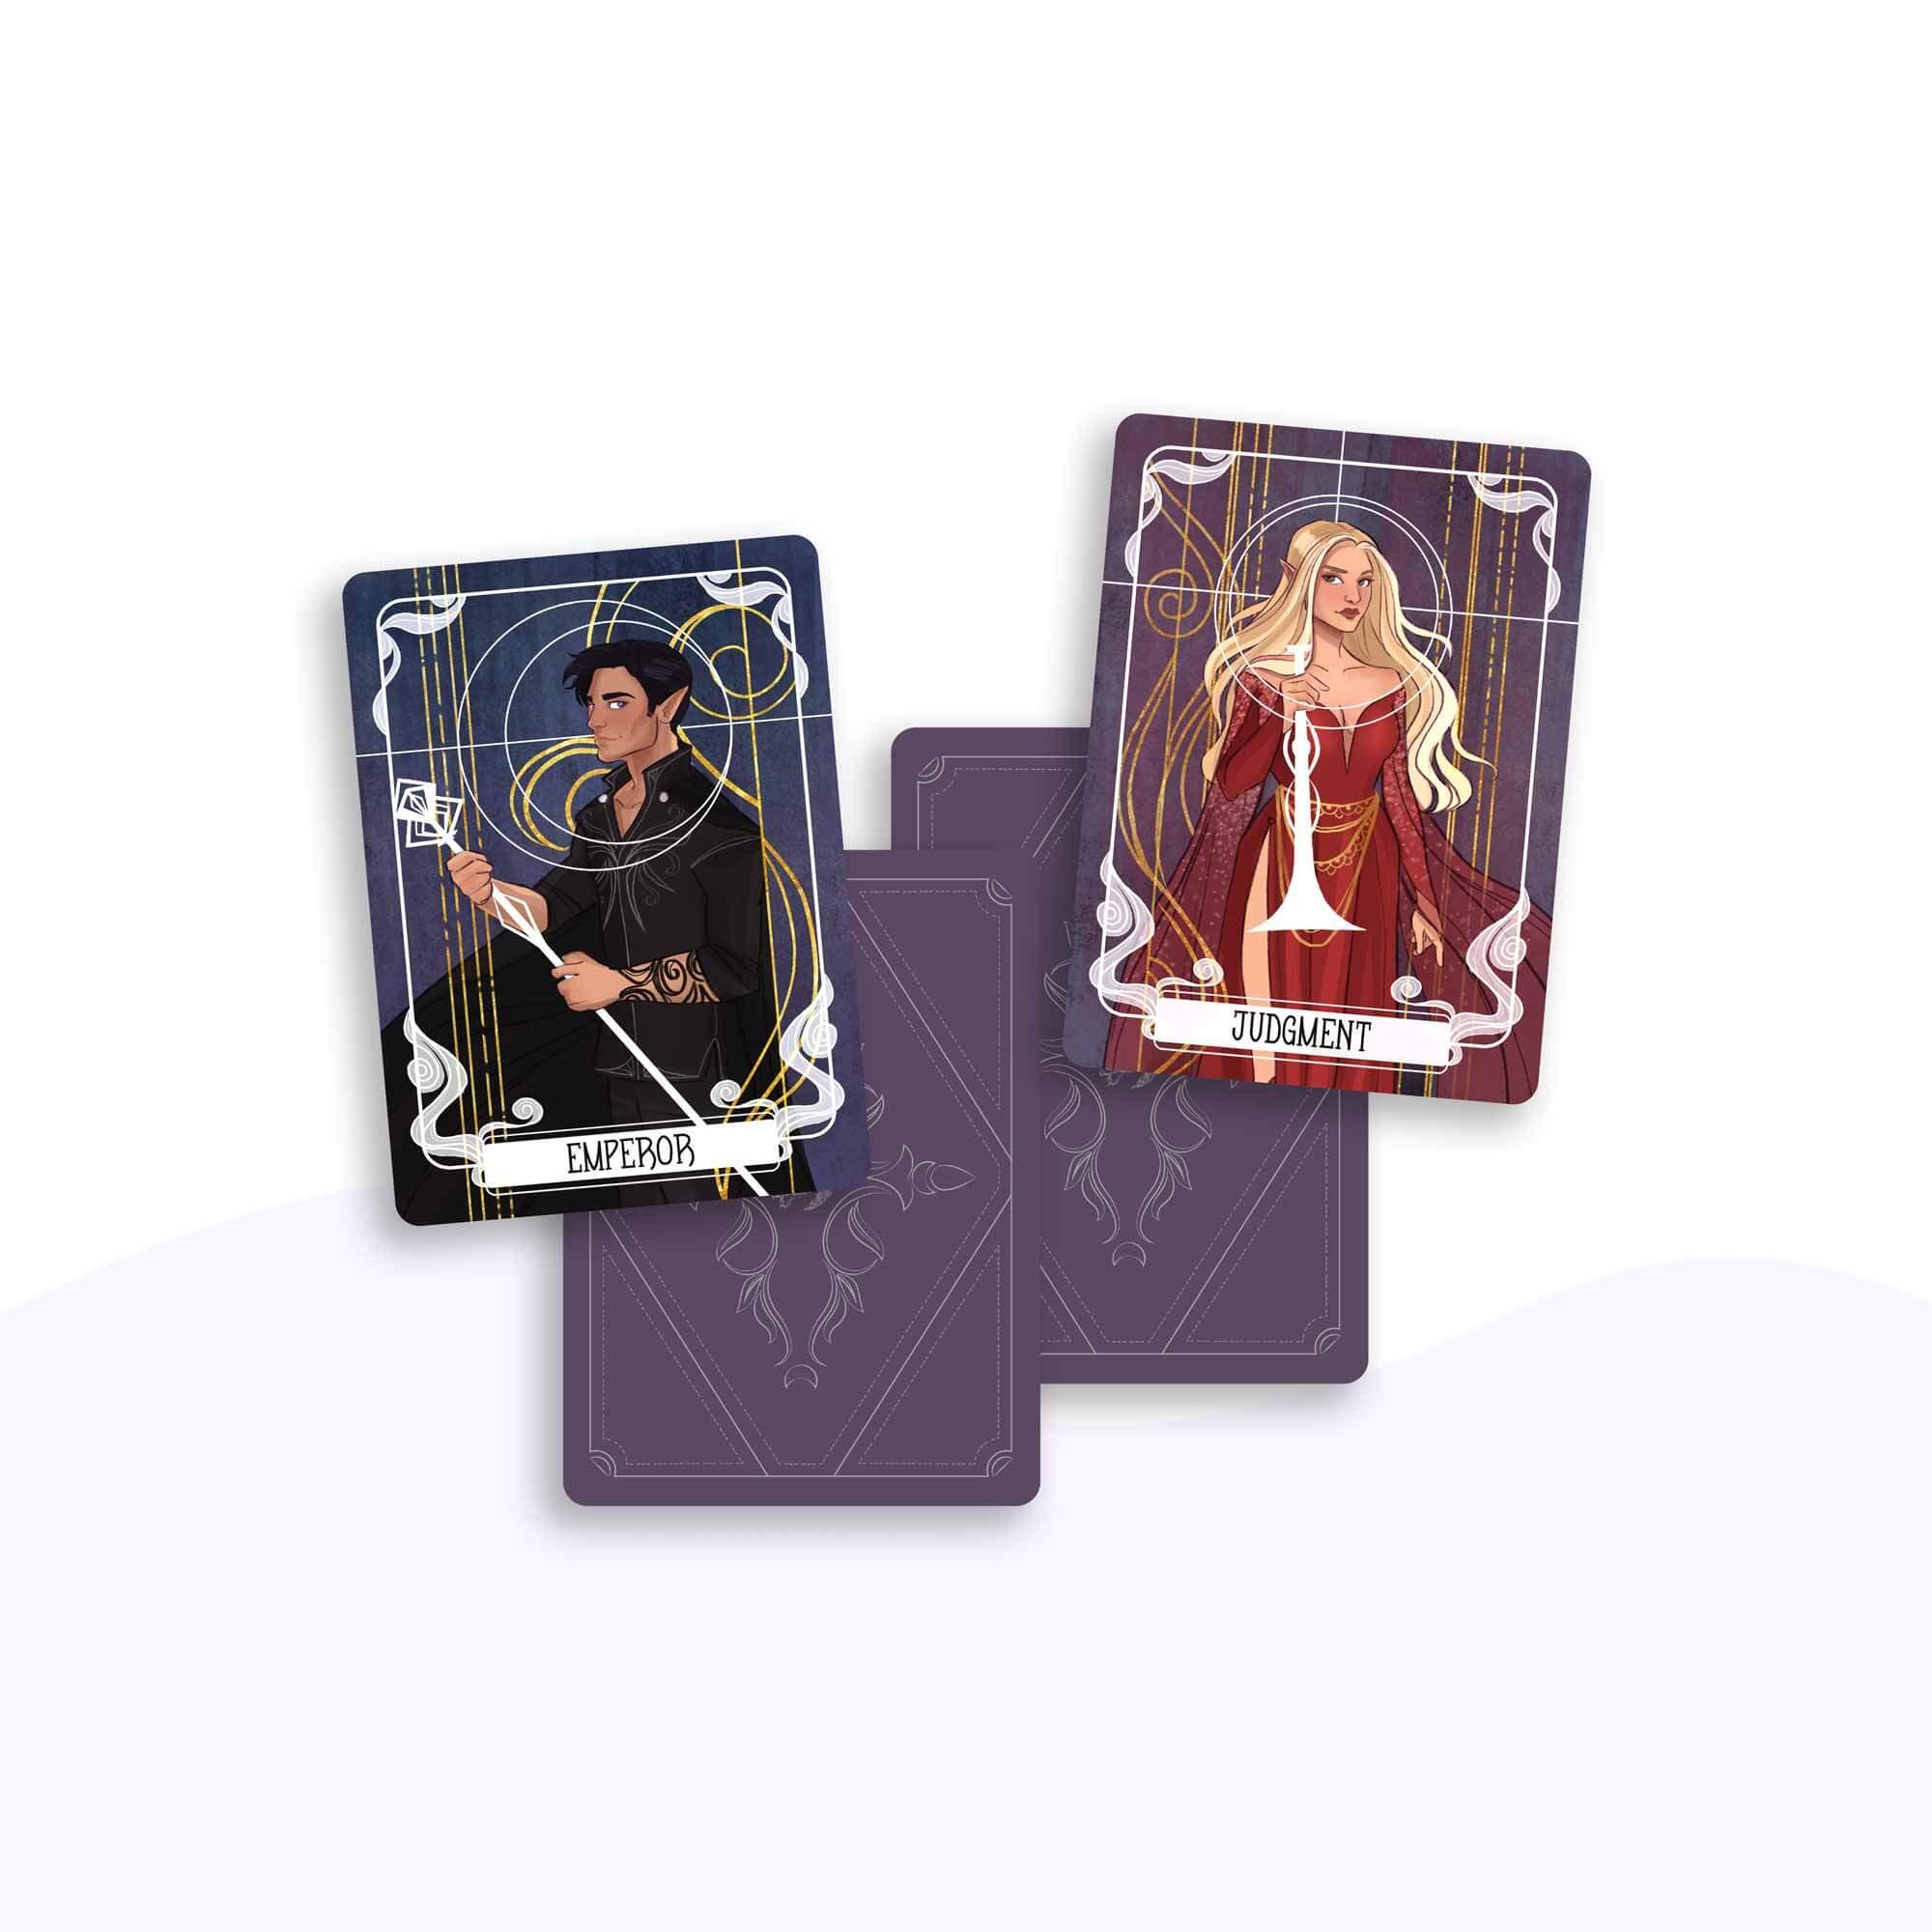 Emperor & Judgement Tarot Cards